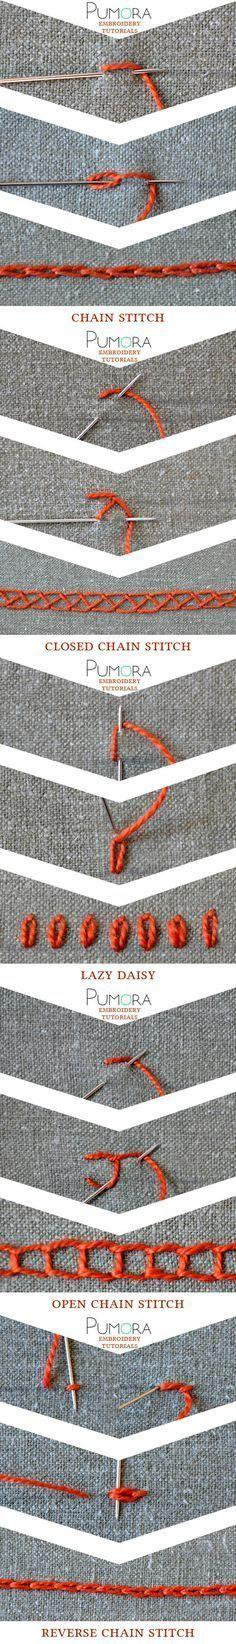 embroidery tutorials: chain stitch with variations broderie, ricamo, sticken, bordado                                                                                                                                                                                 Más